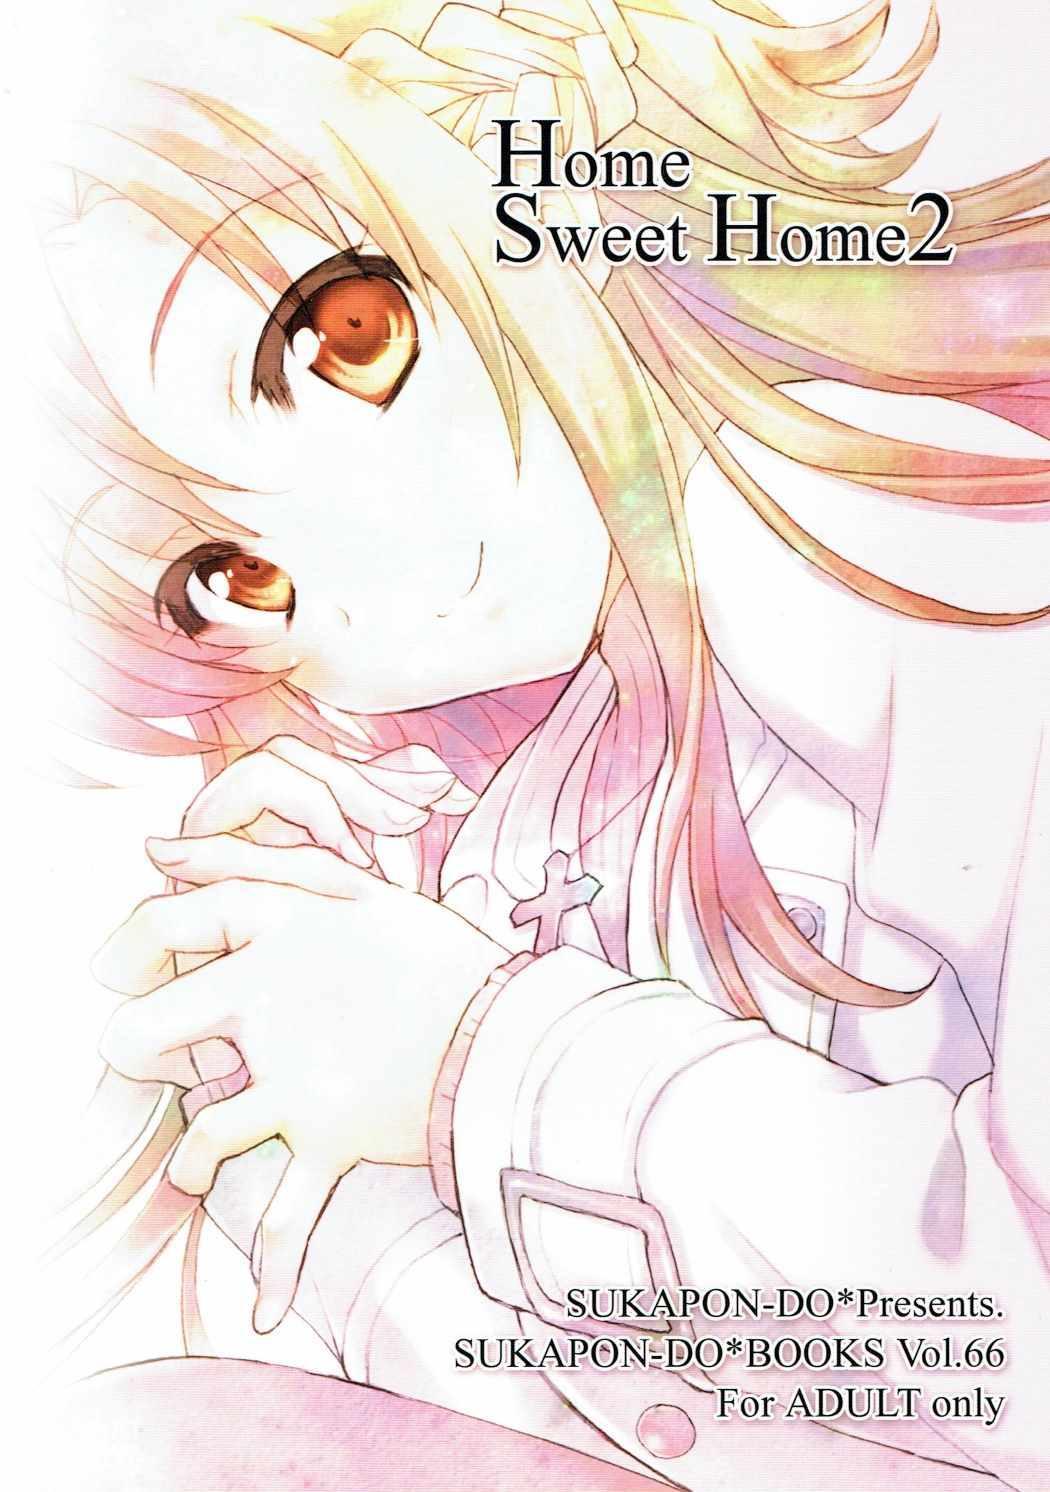 Home Sweet Home 2 21